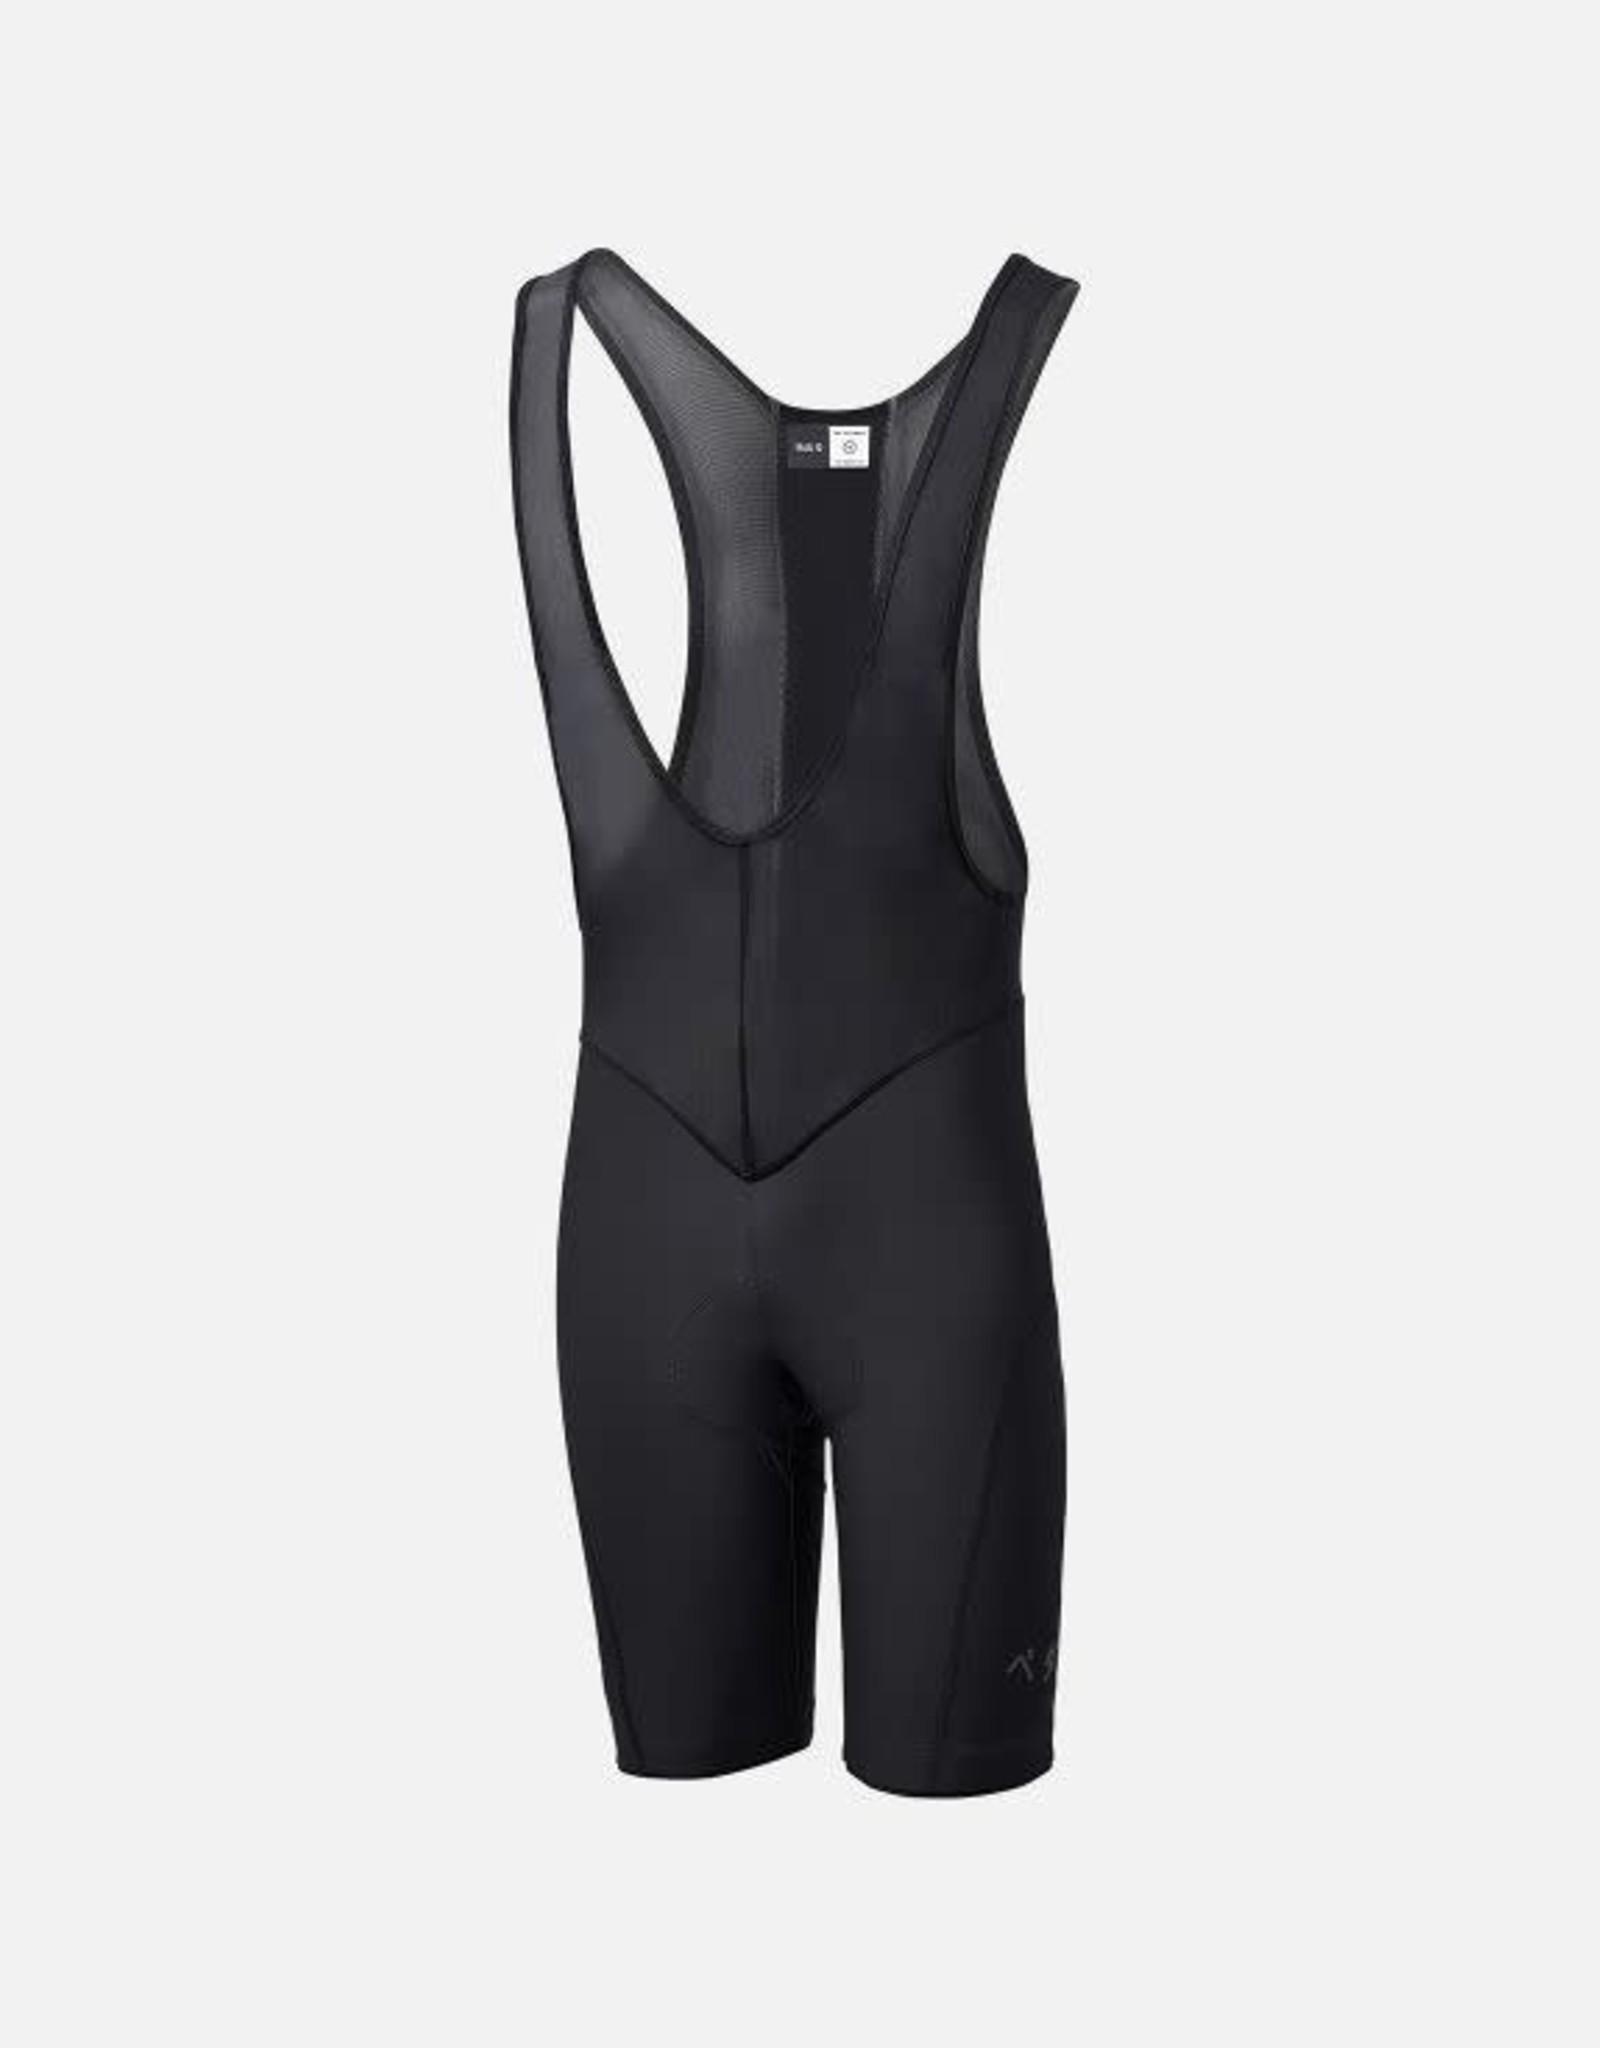 Pedal Ed Natsu Bib Shorts - Black